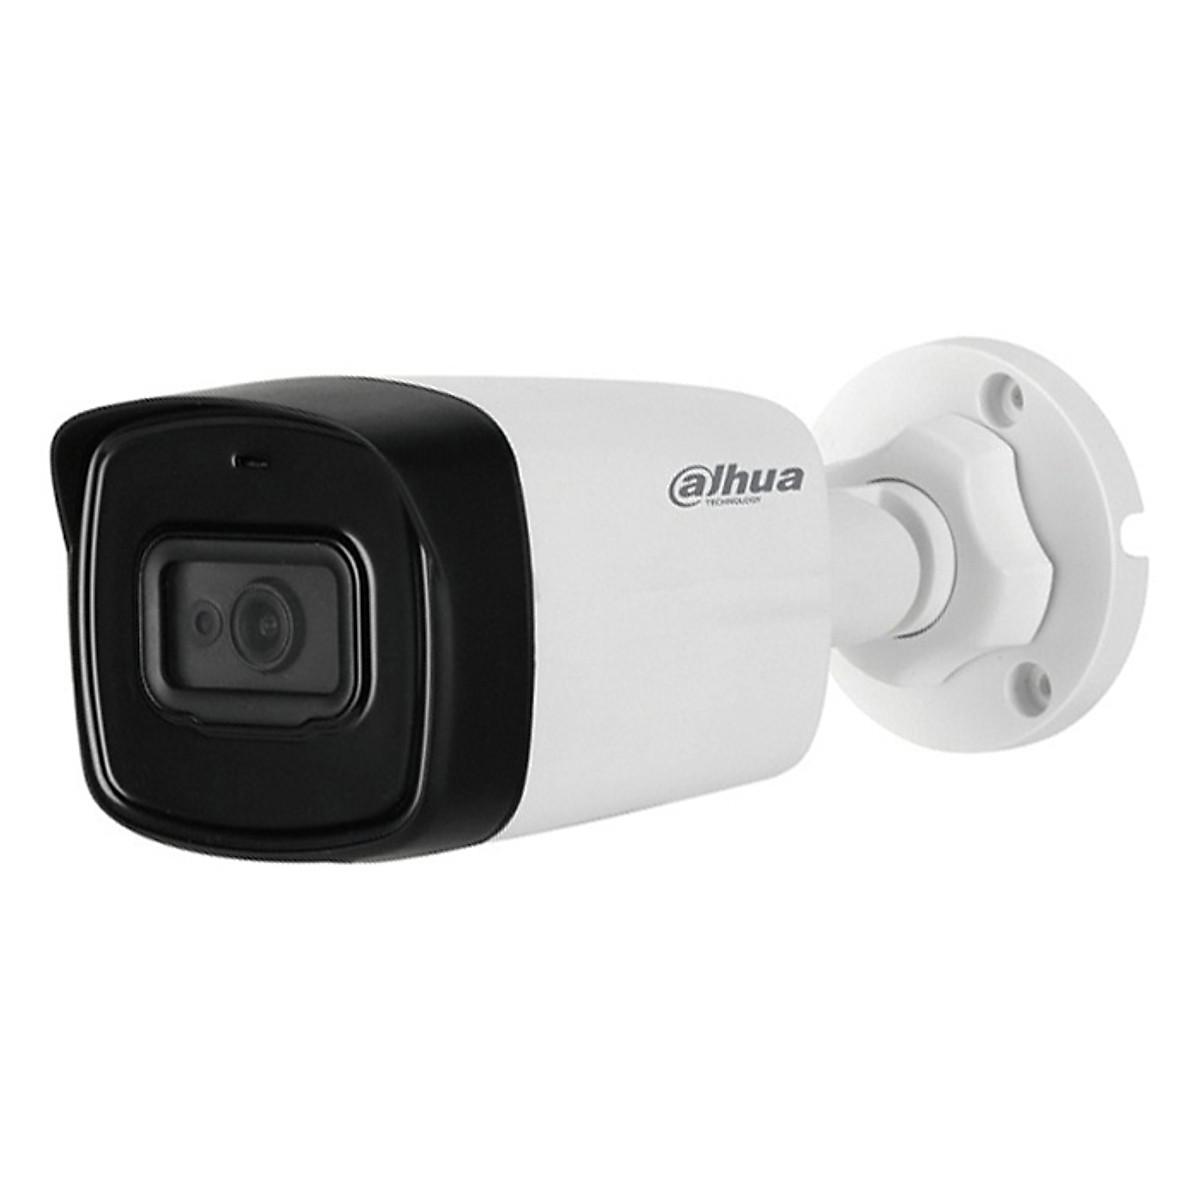 Camera Dahua HAC-HFW1200THP-S4 2.0 Megapixel – Hàng Nhập Khẩu